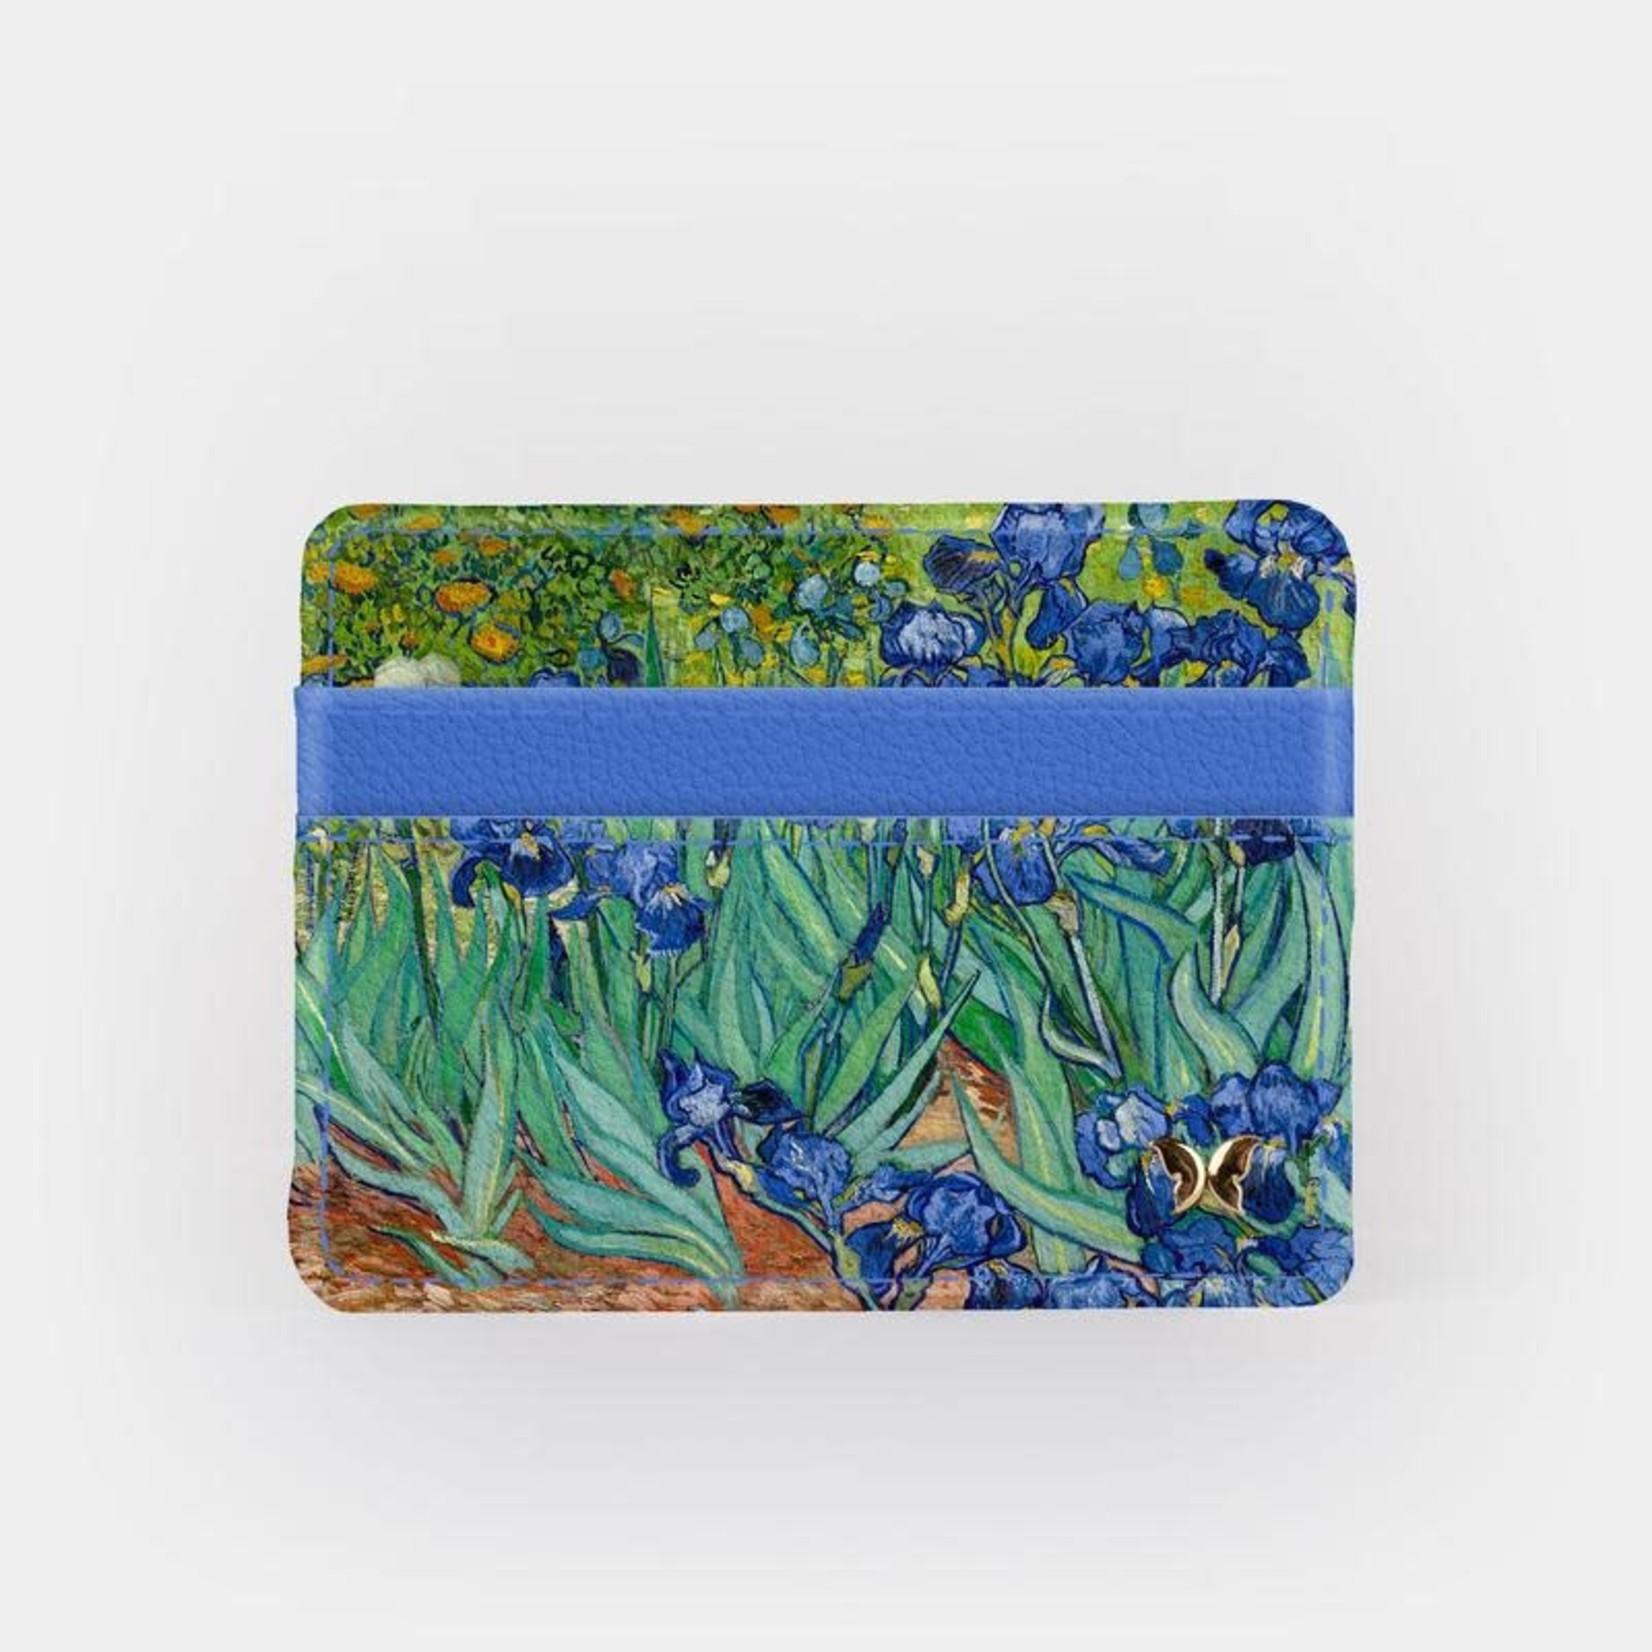 Monarque Slim Wallet - Van Gogh - Irises